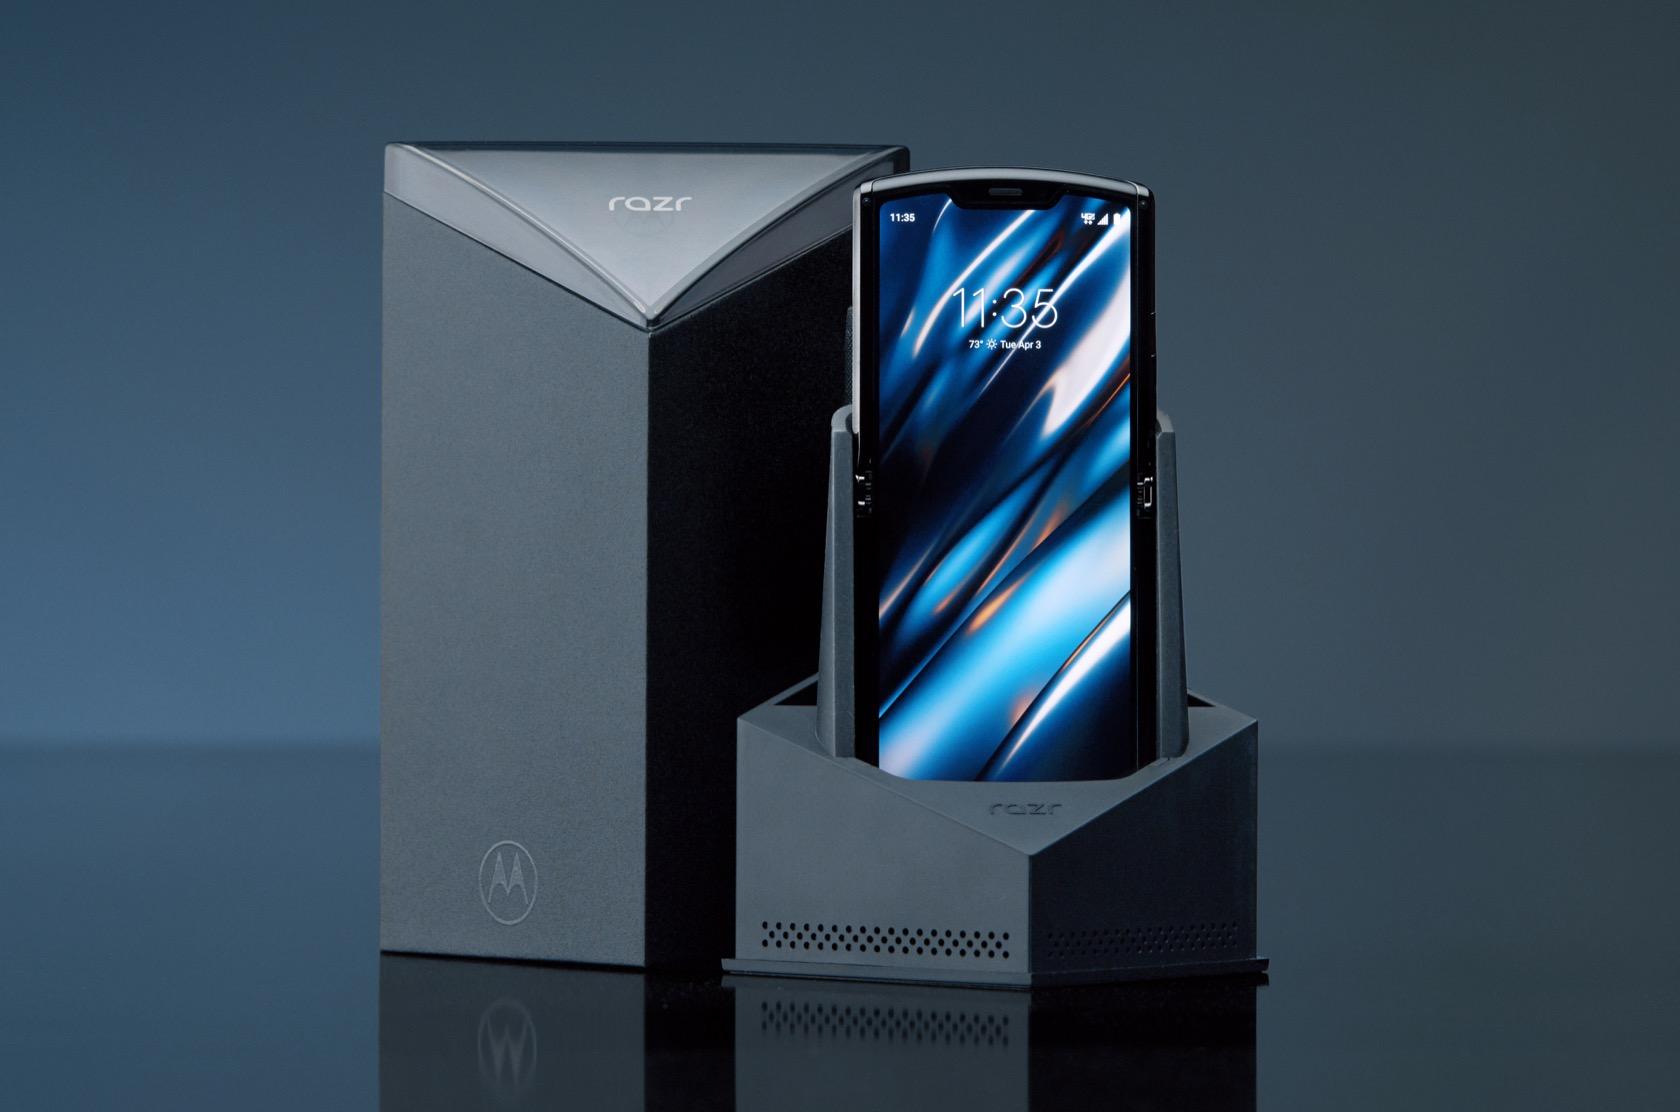 摩托罗拉Razr宣告重生 – 一台折叠屏Android手机的照片 - 4